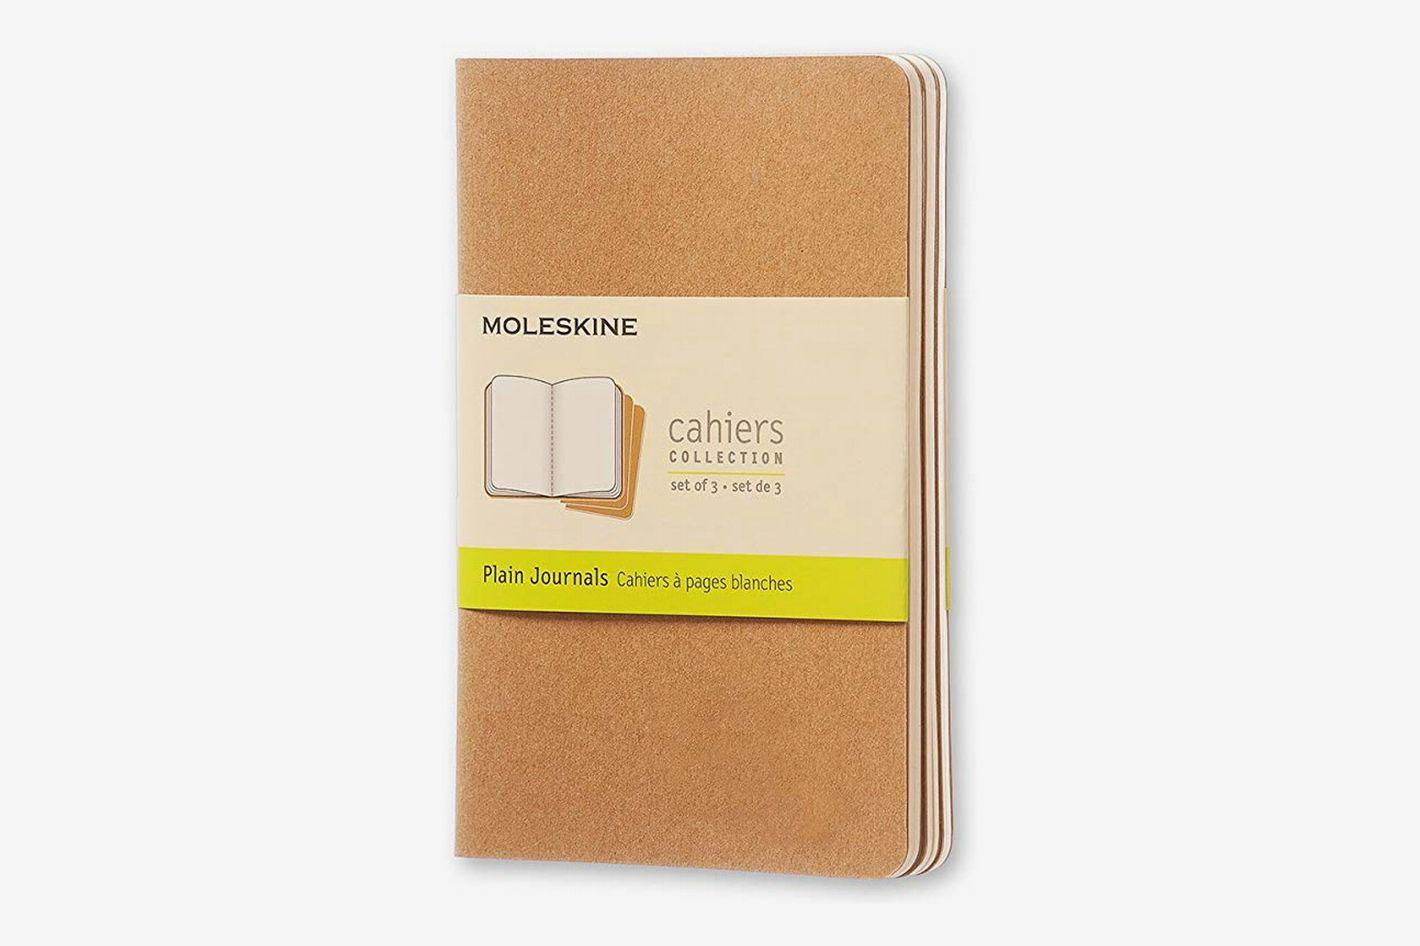 Moleskine Cahier Soft Cover Journal, Set of 3